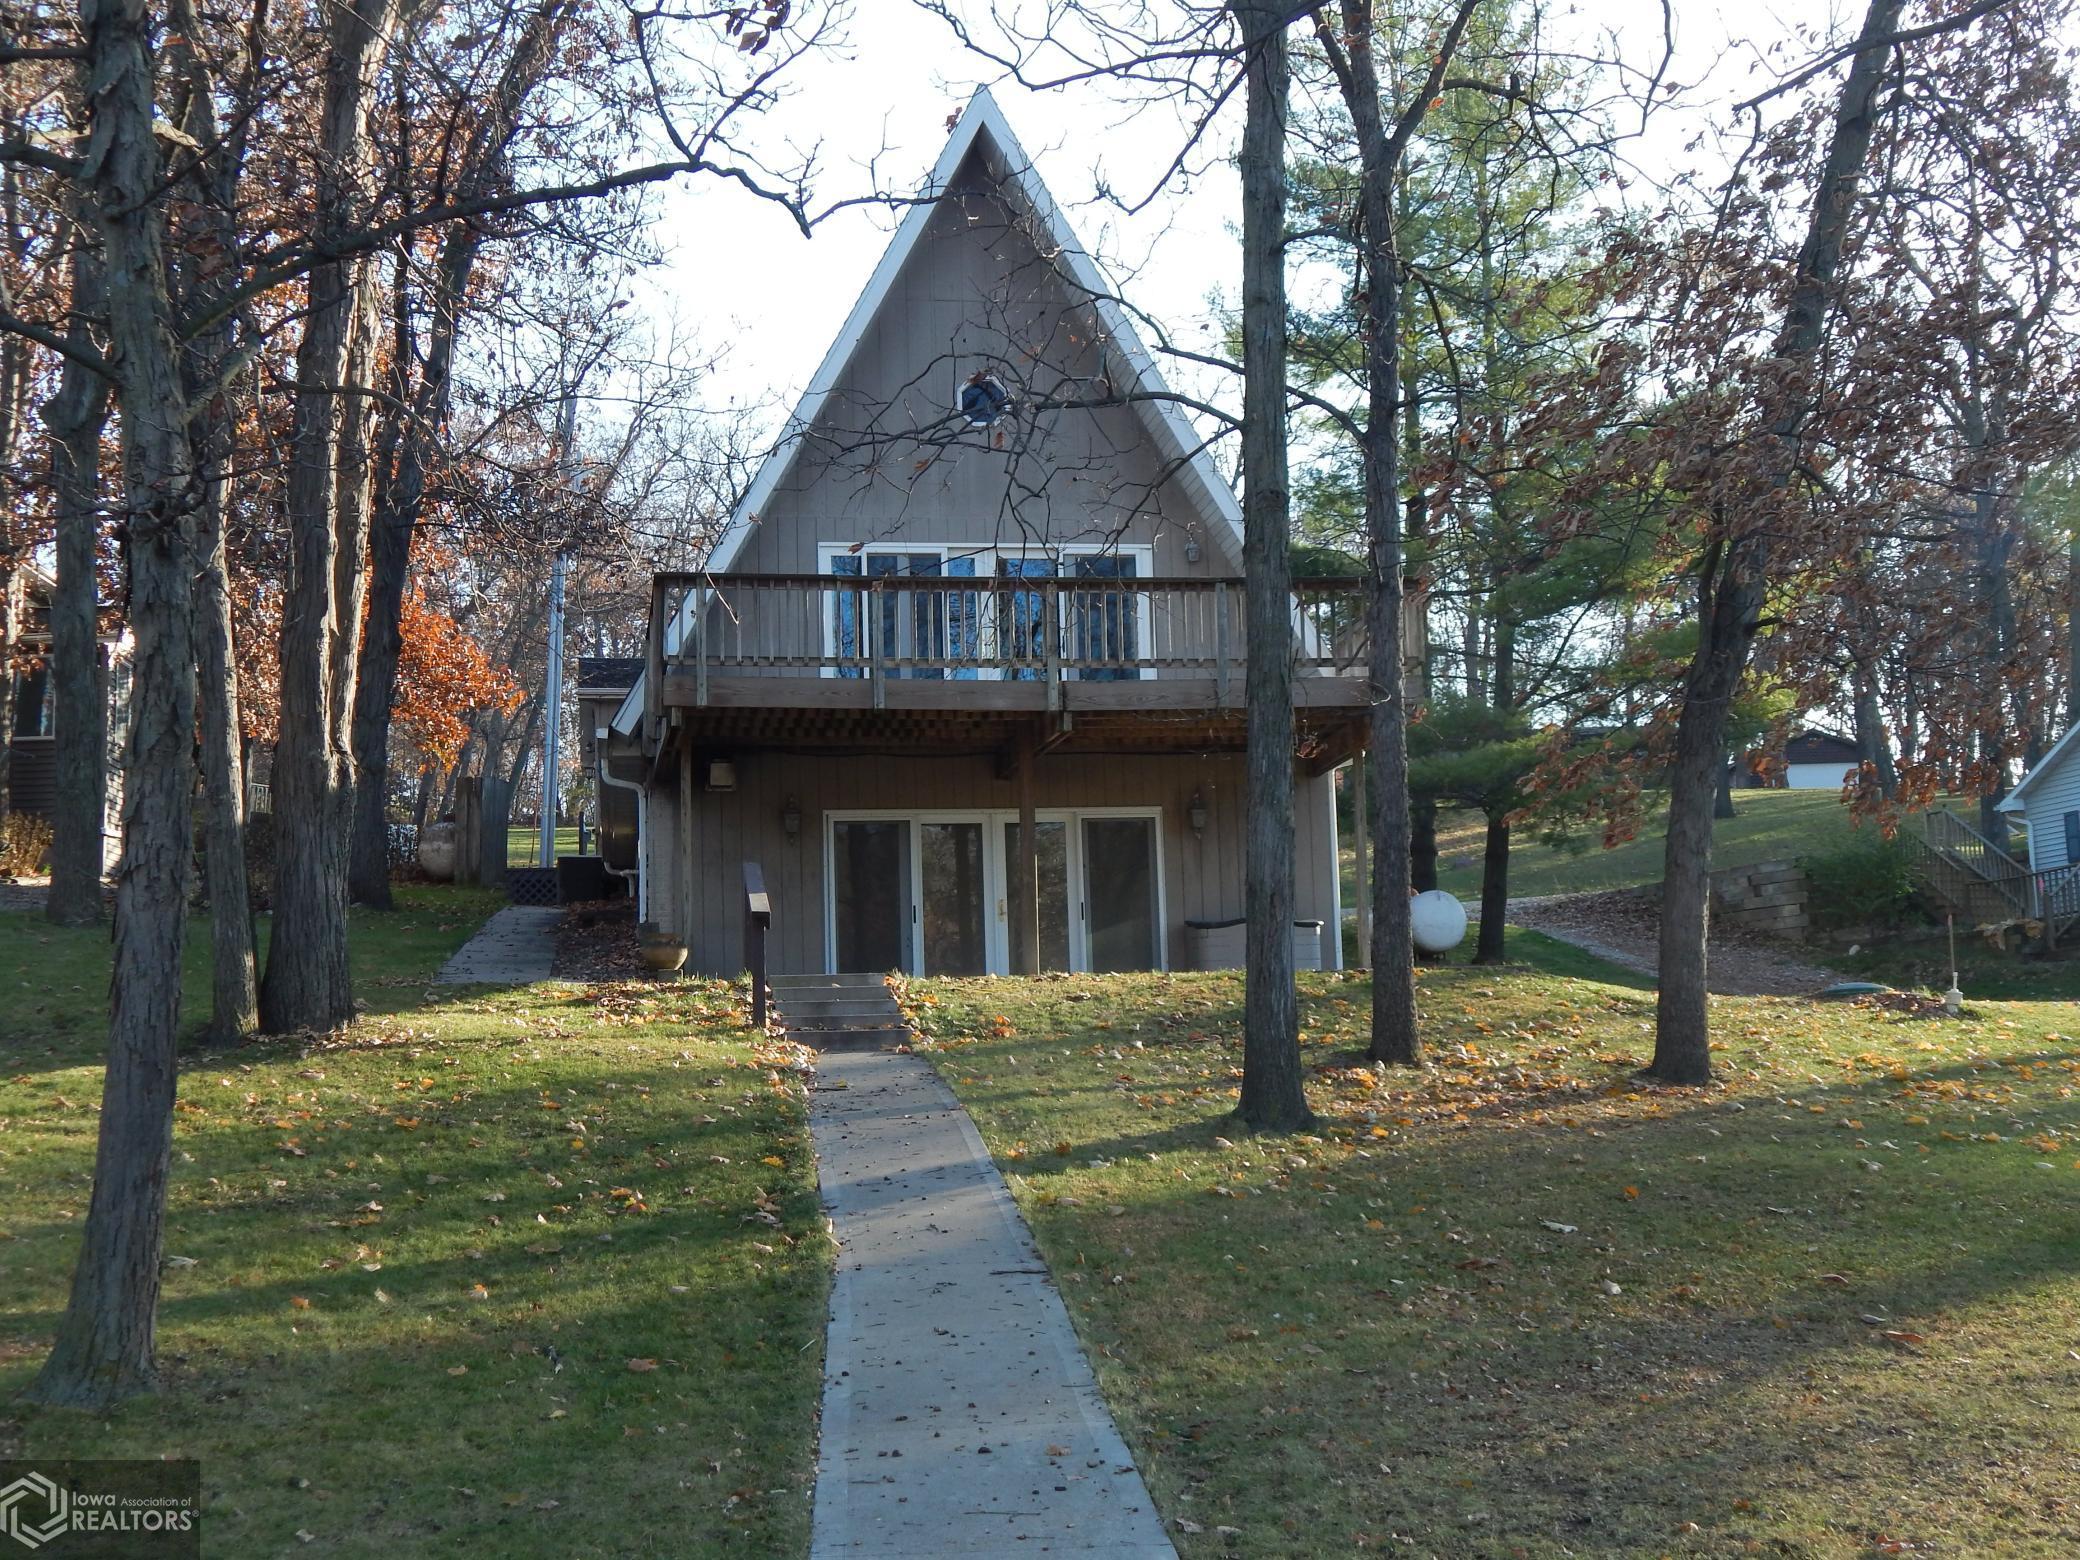 230 Hillcrest, Montezuma, Iowa 50171-8483, 3 Bedrooms Bedrooms, ,1 BathroomBathrooms,Single Family,For Sale,Hillcrest,5683857